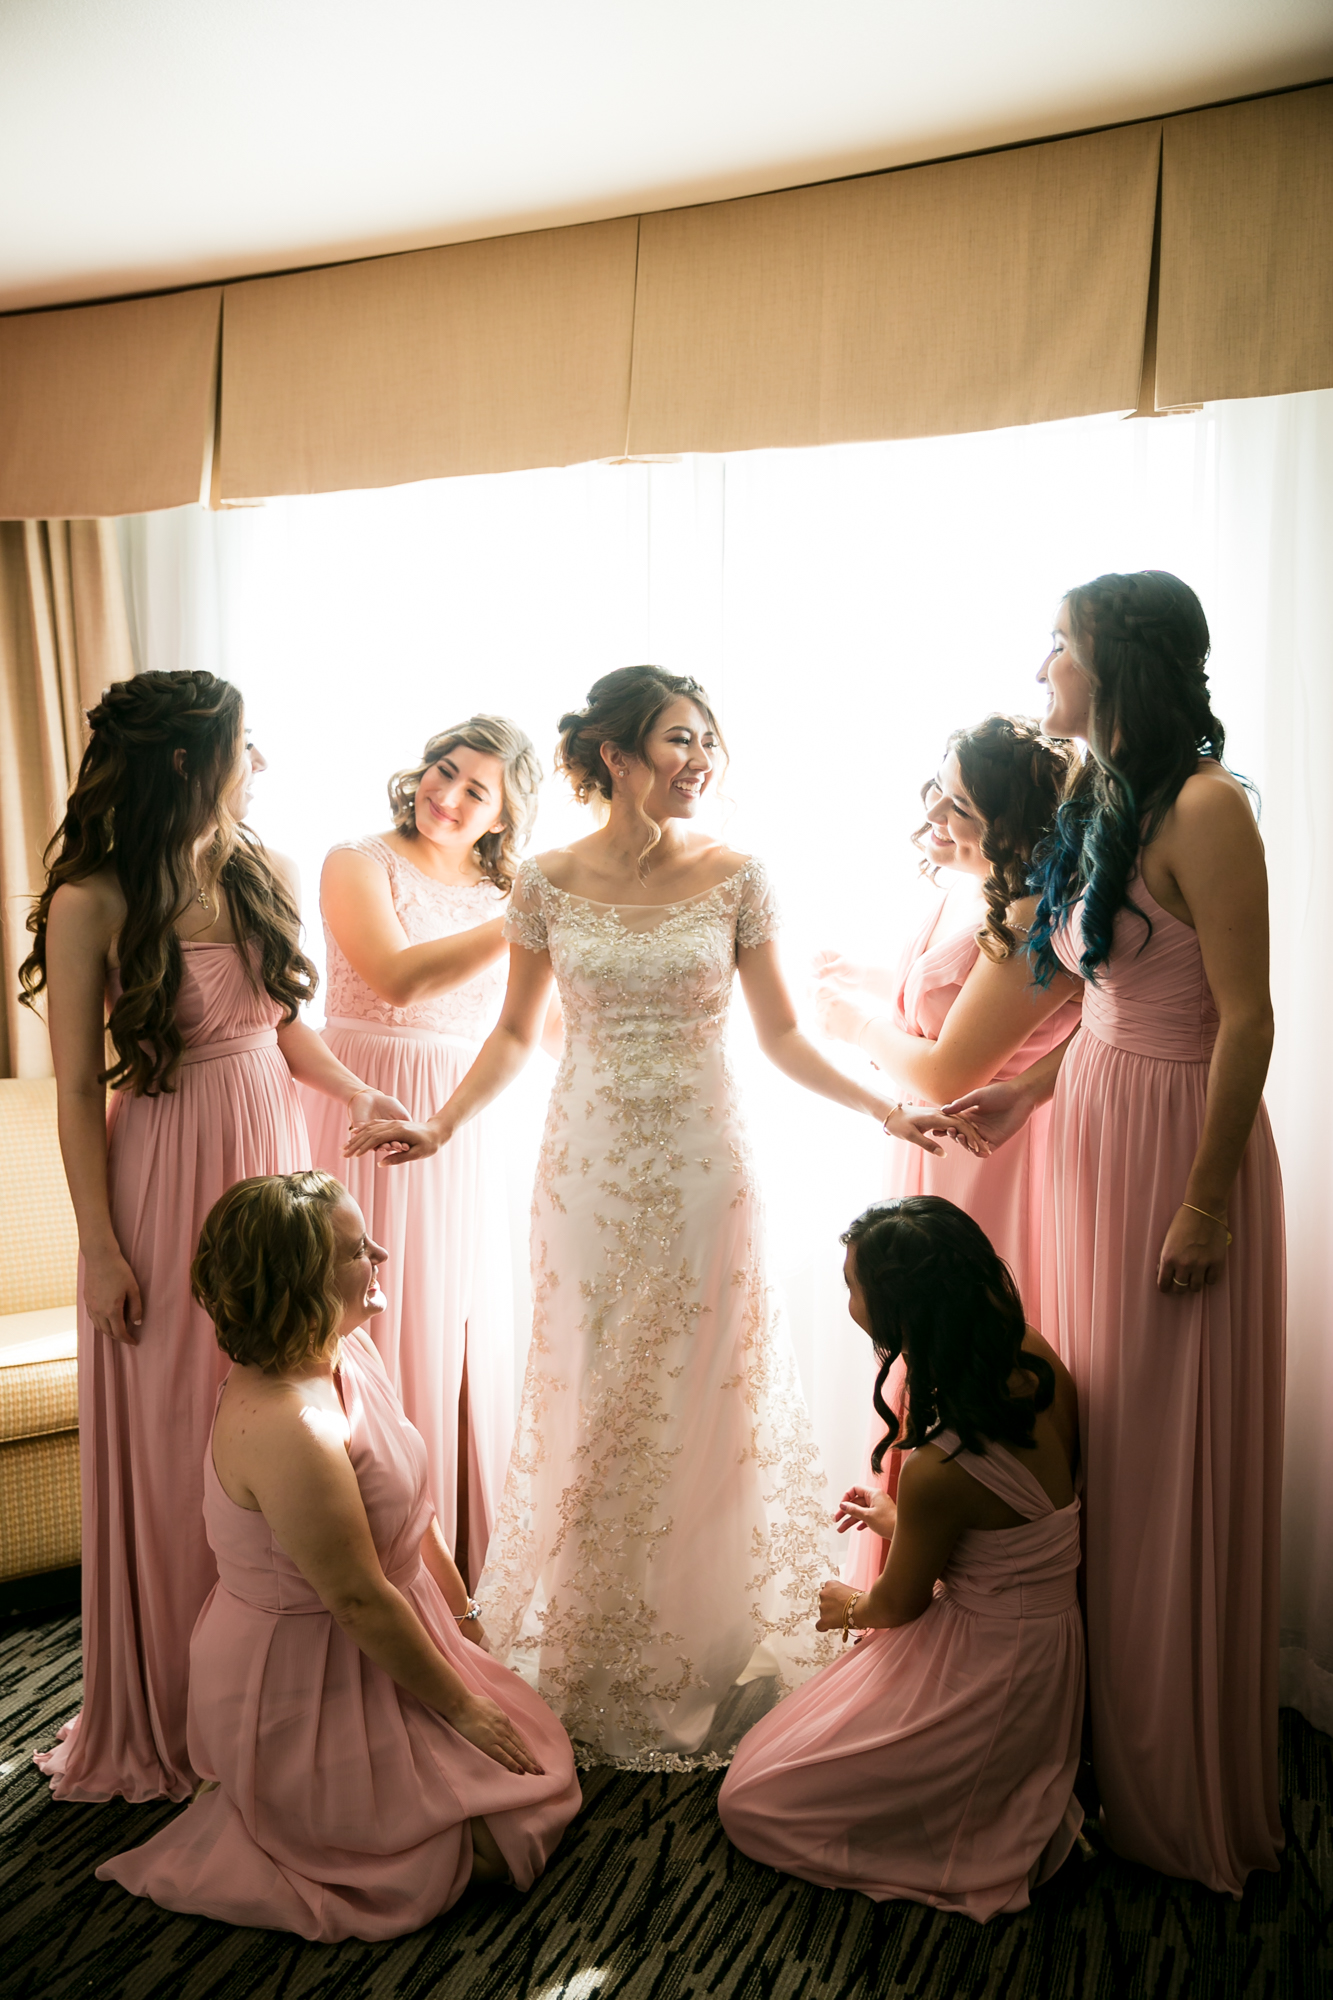 SA-Coyote-Hills-Fullerton-Wedding-Photography-0005.jpg